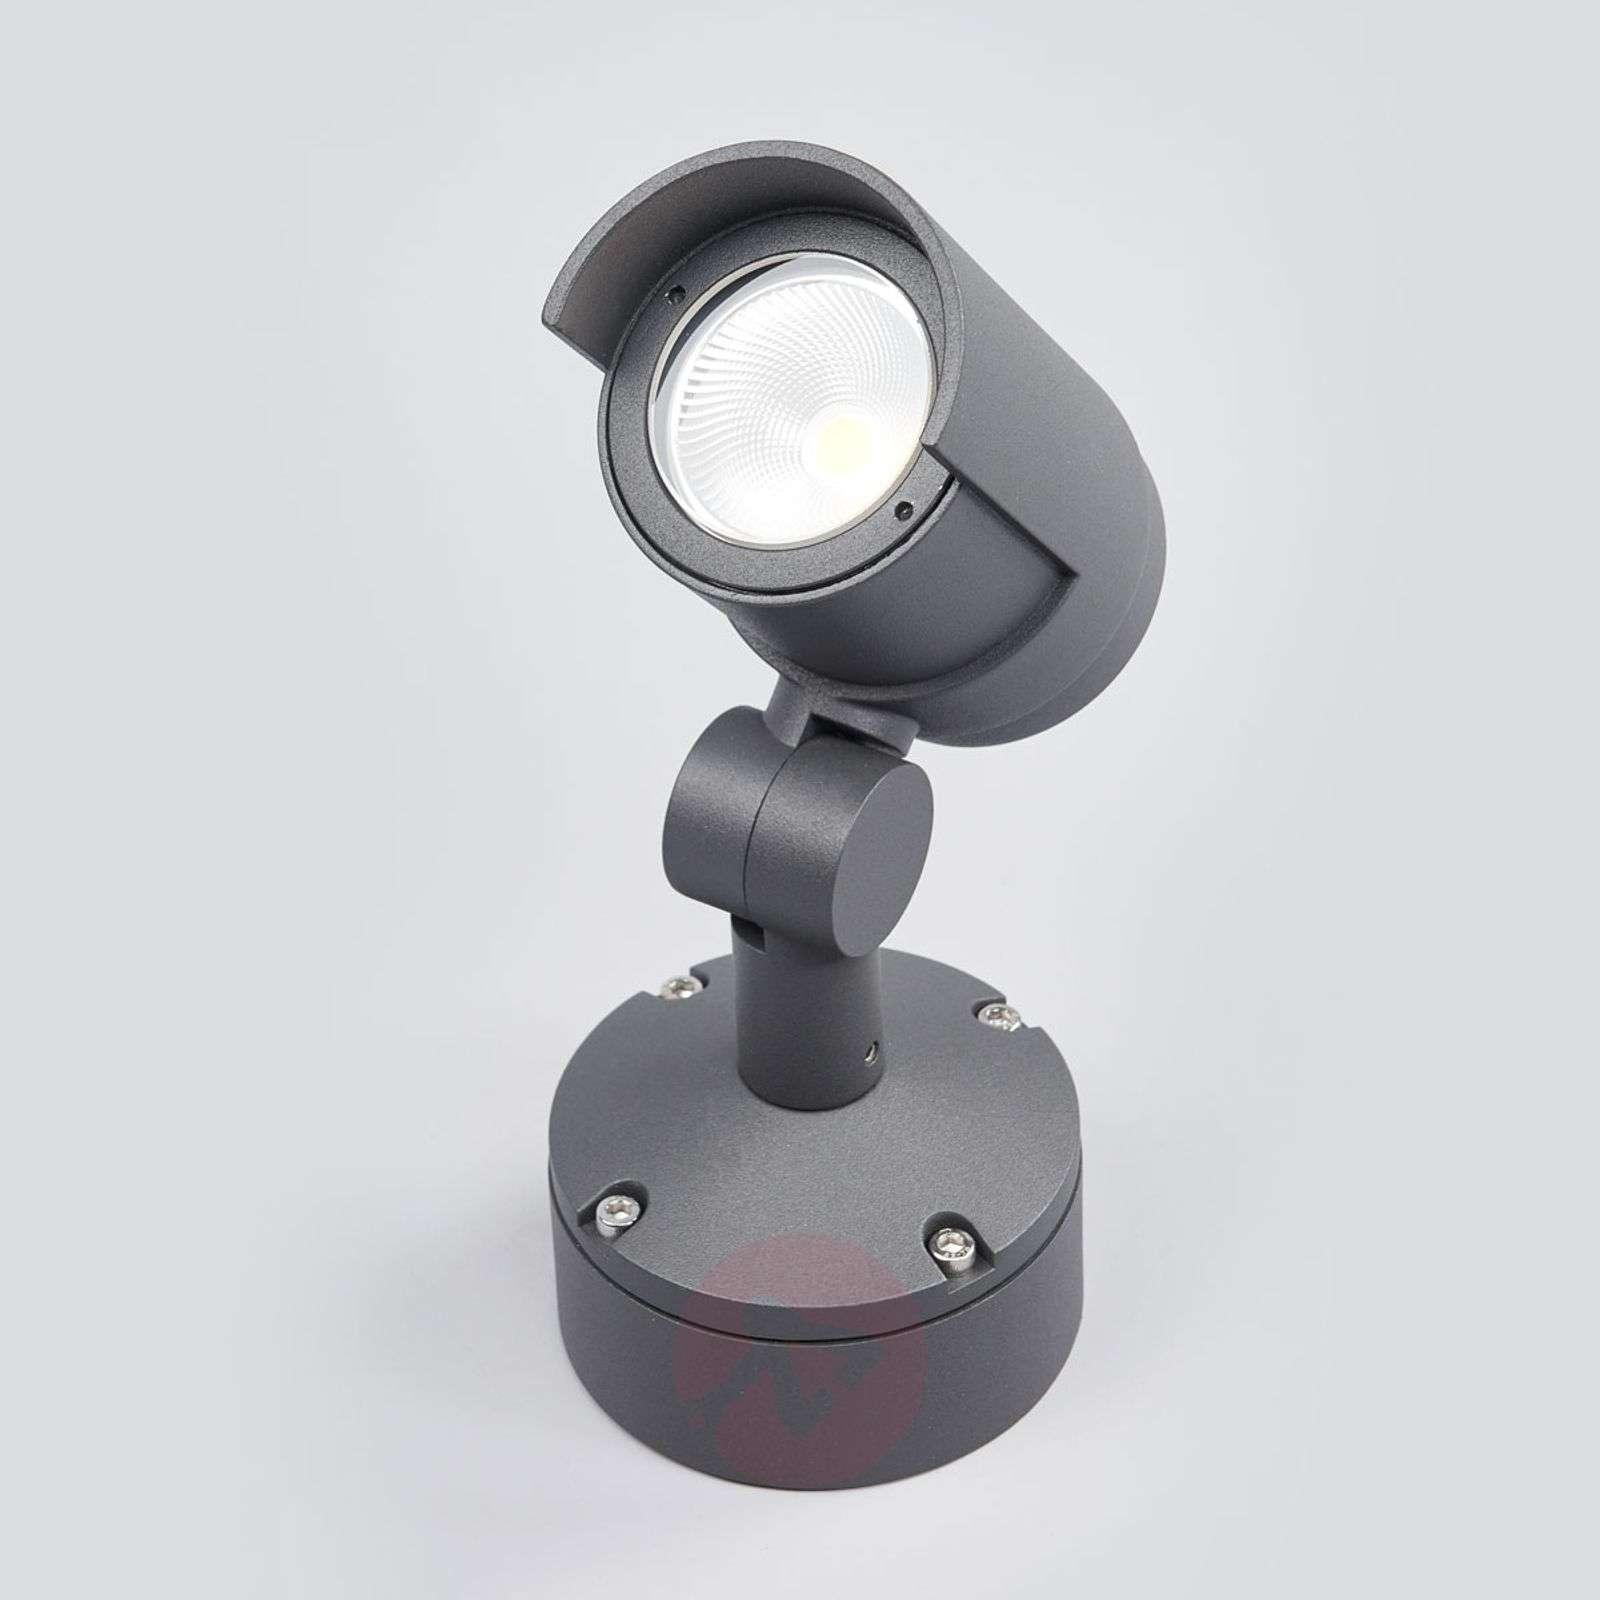 Beatrix-LED-ulkovalaisin tummanharmaana-9616117-01